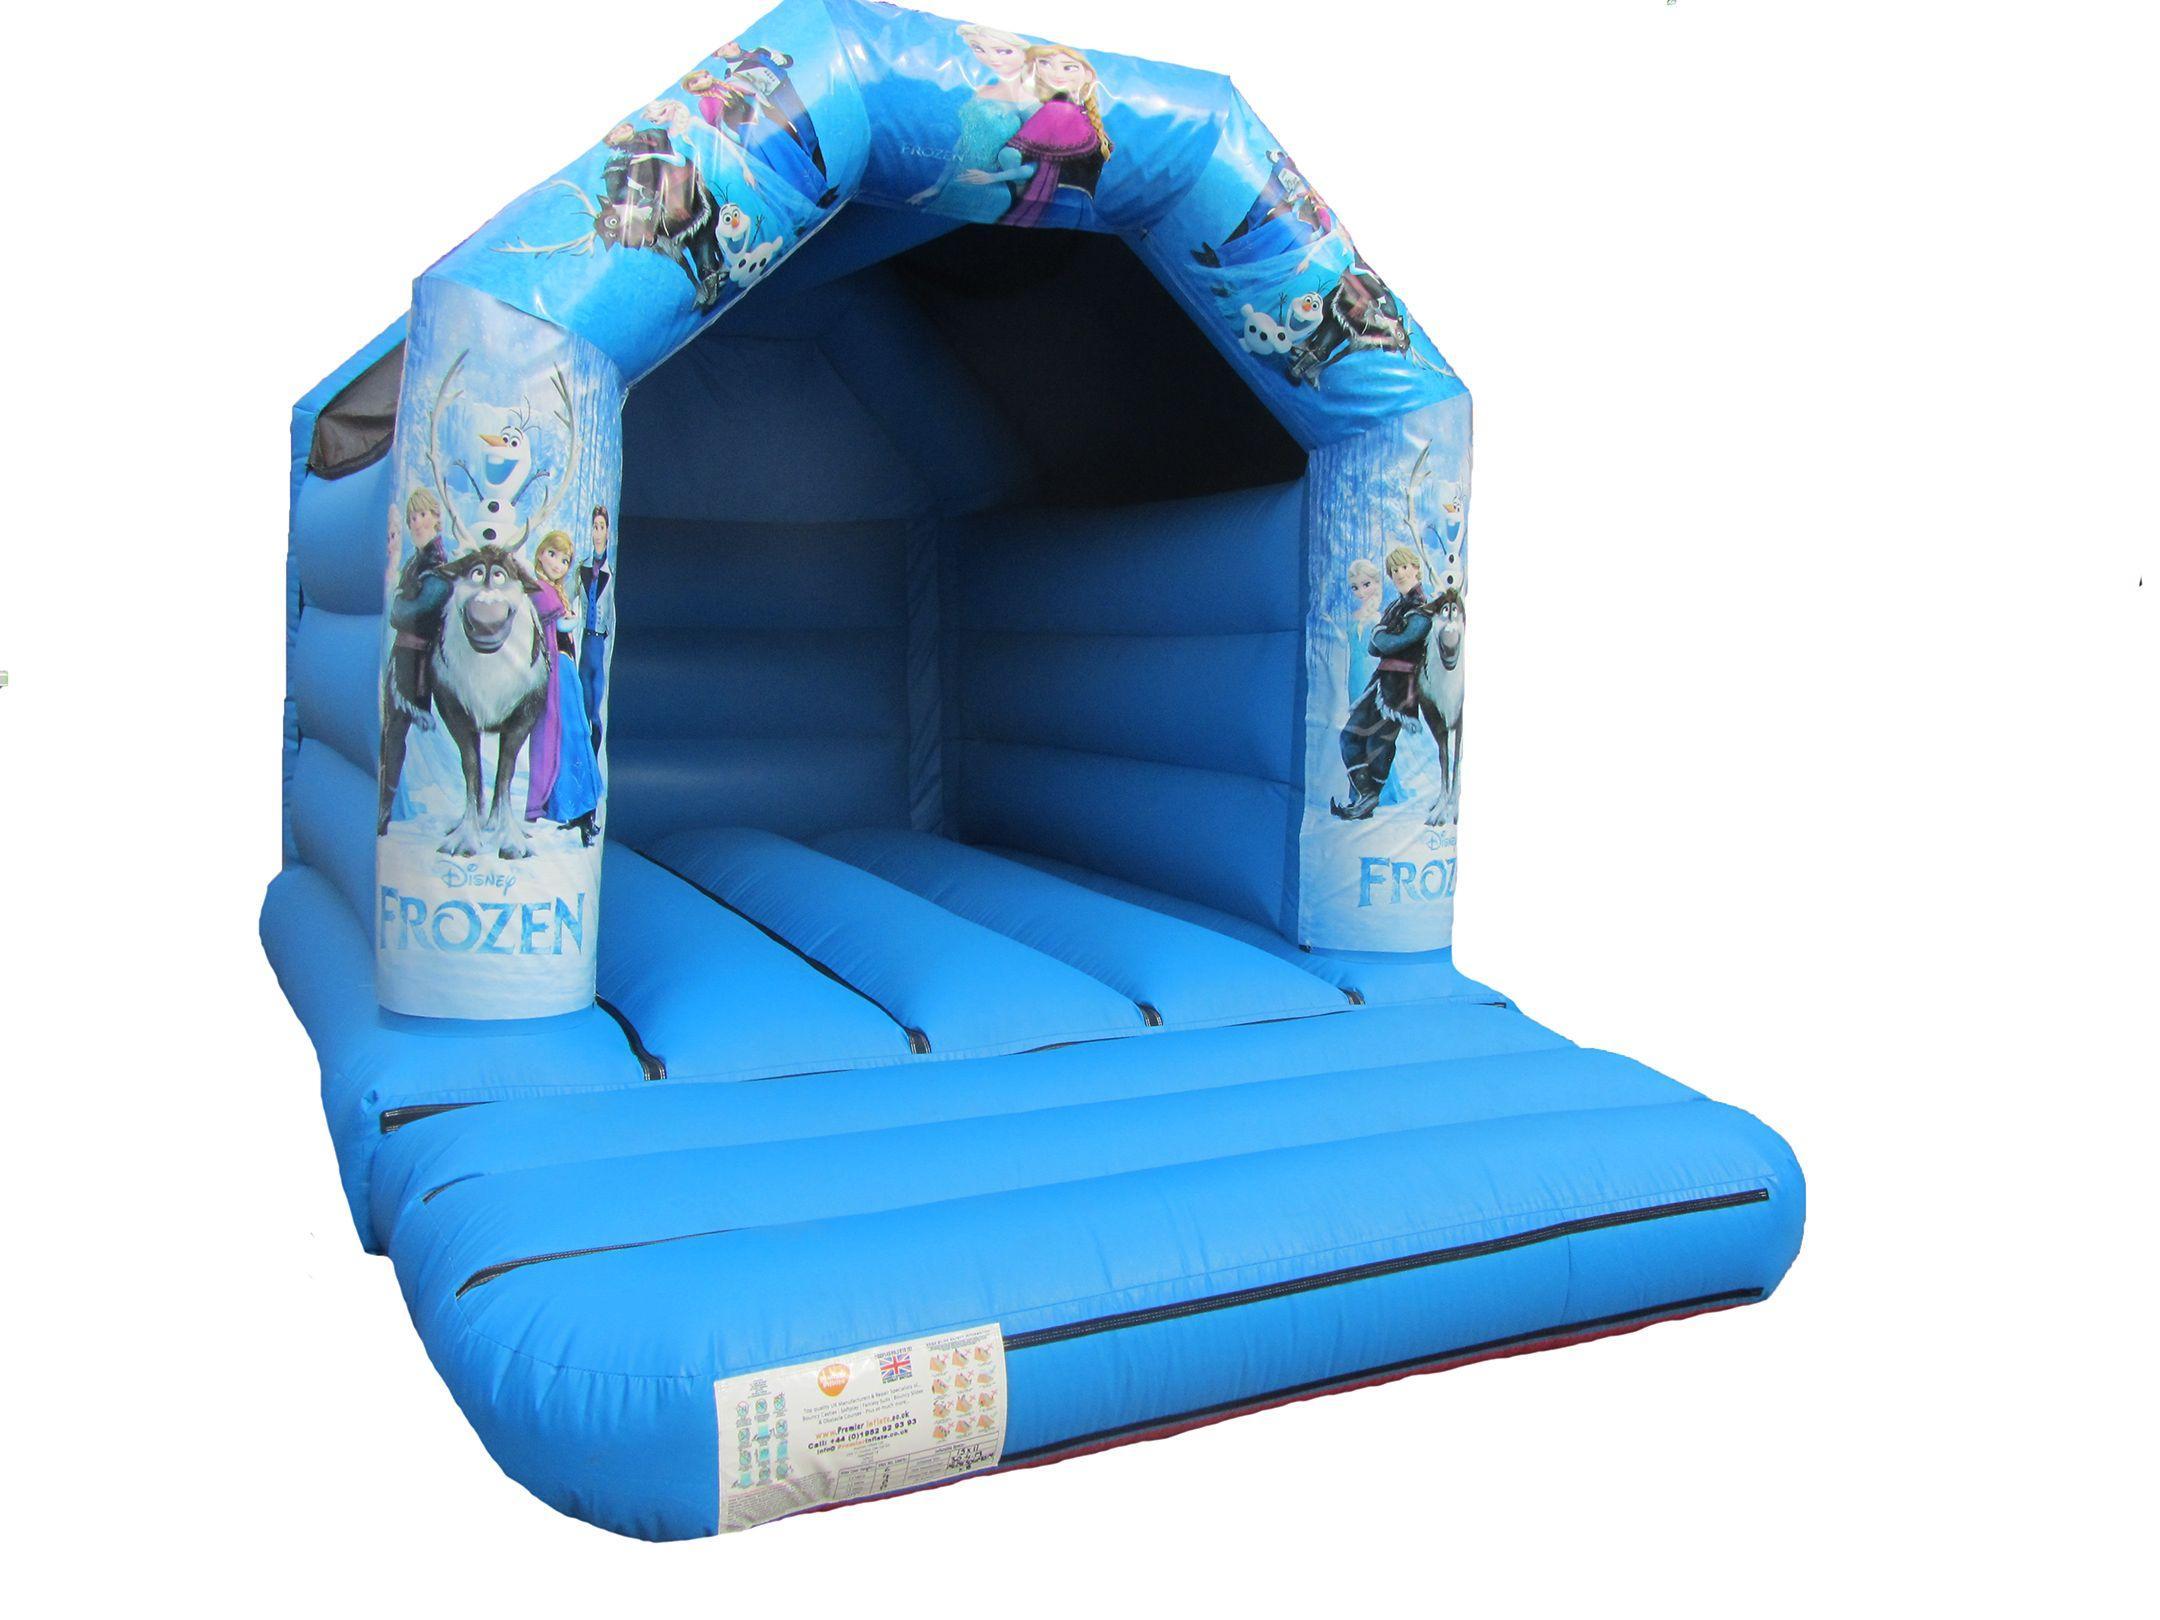 Popular themed Bouncy Castle for Sale